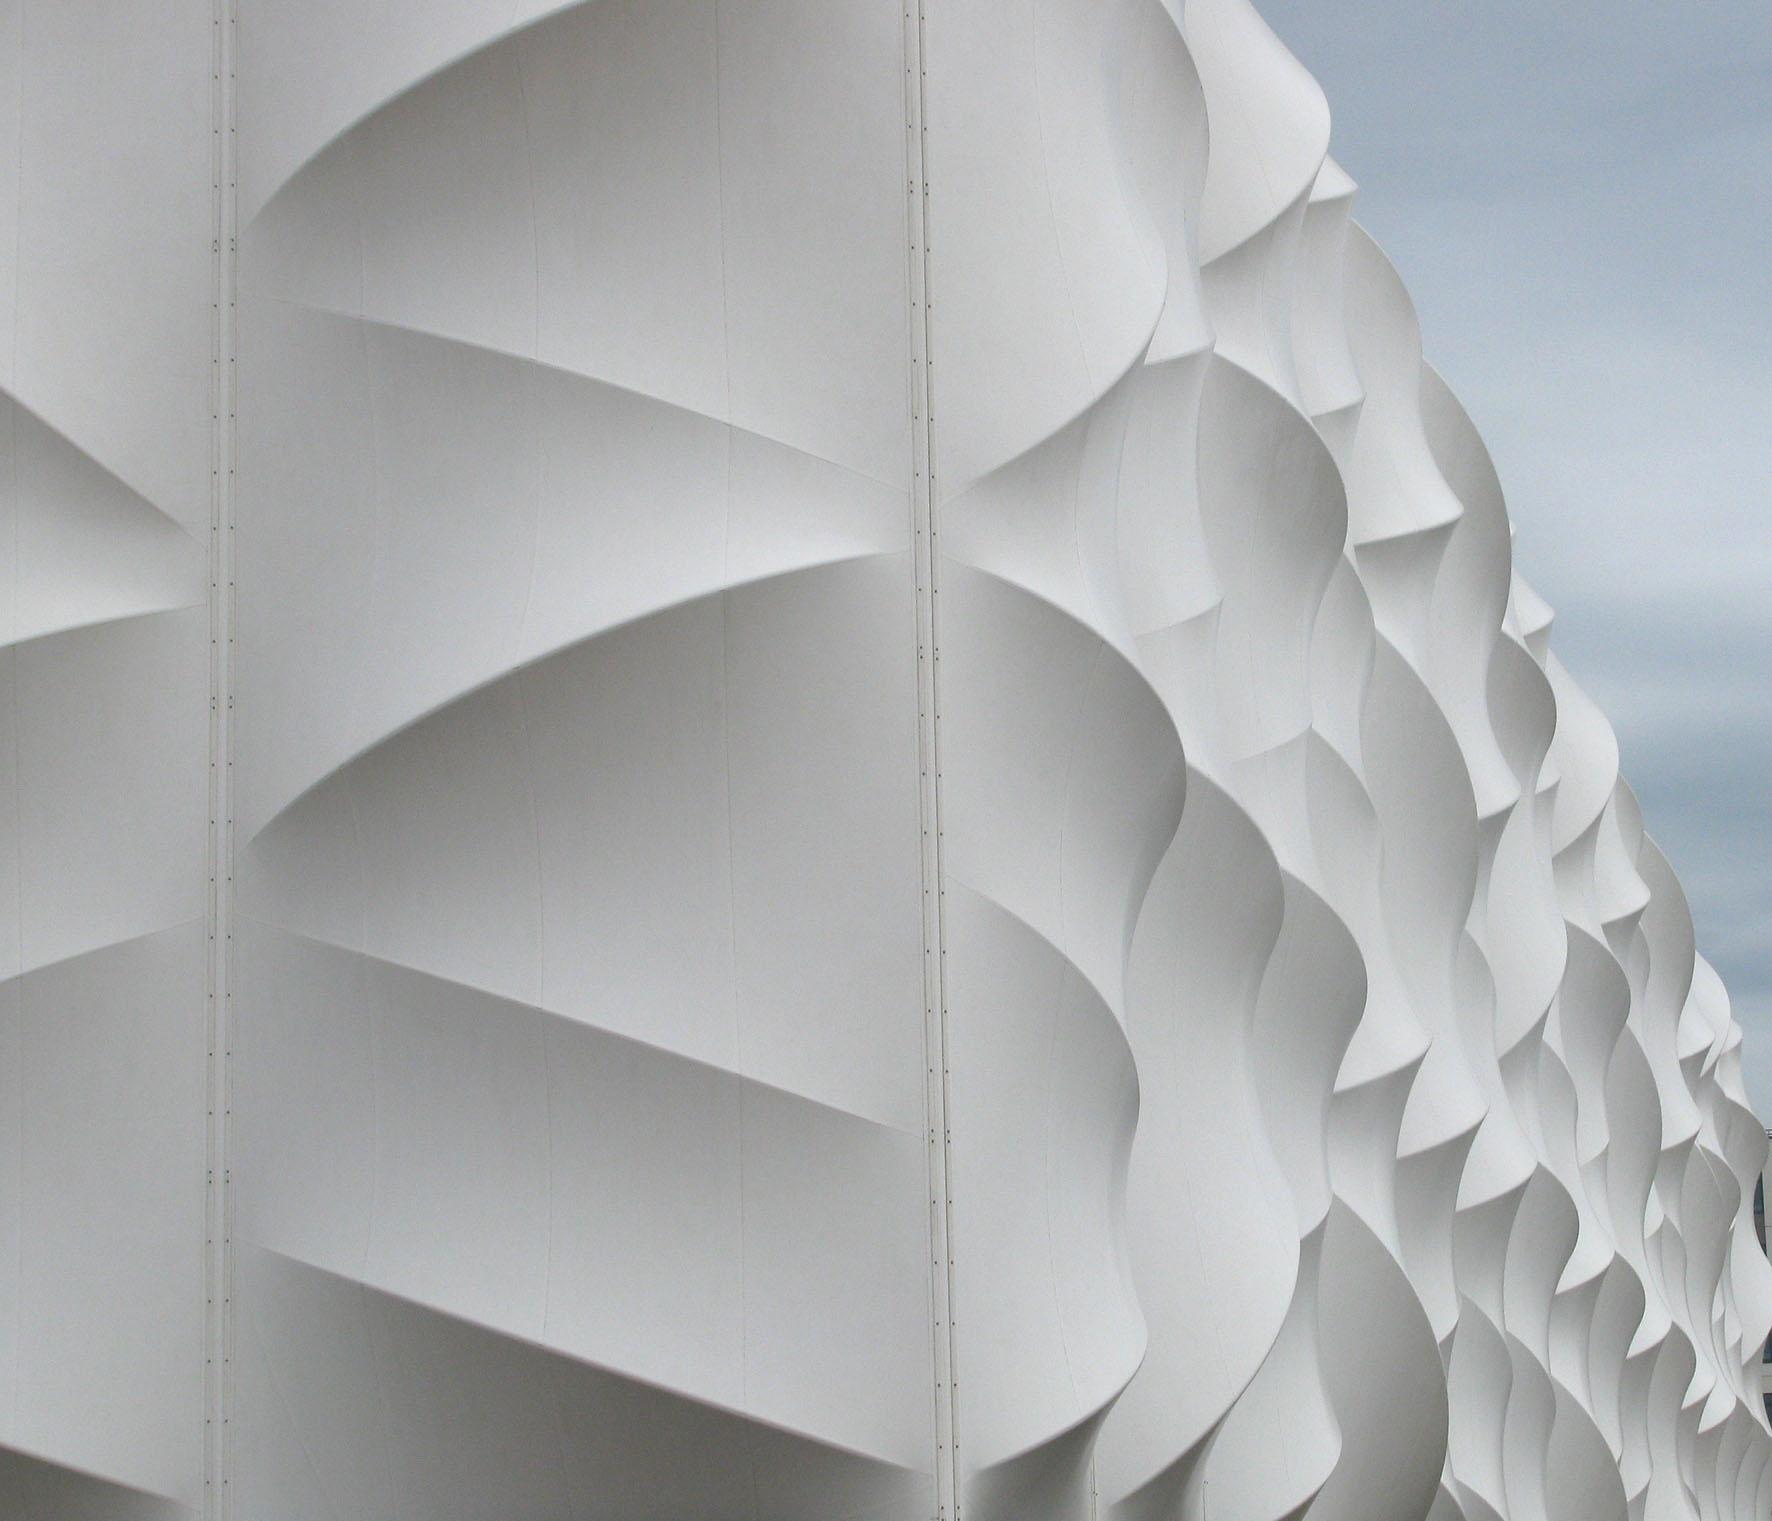 Paper cut architecture